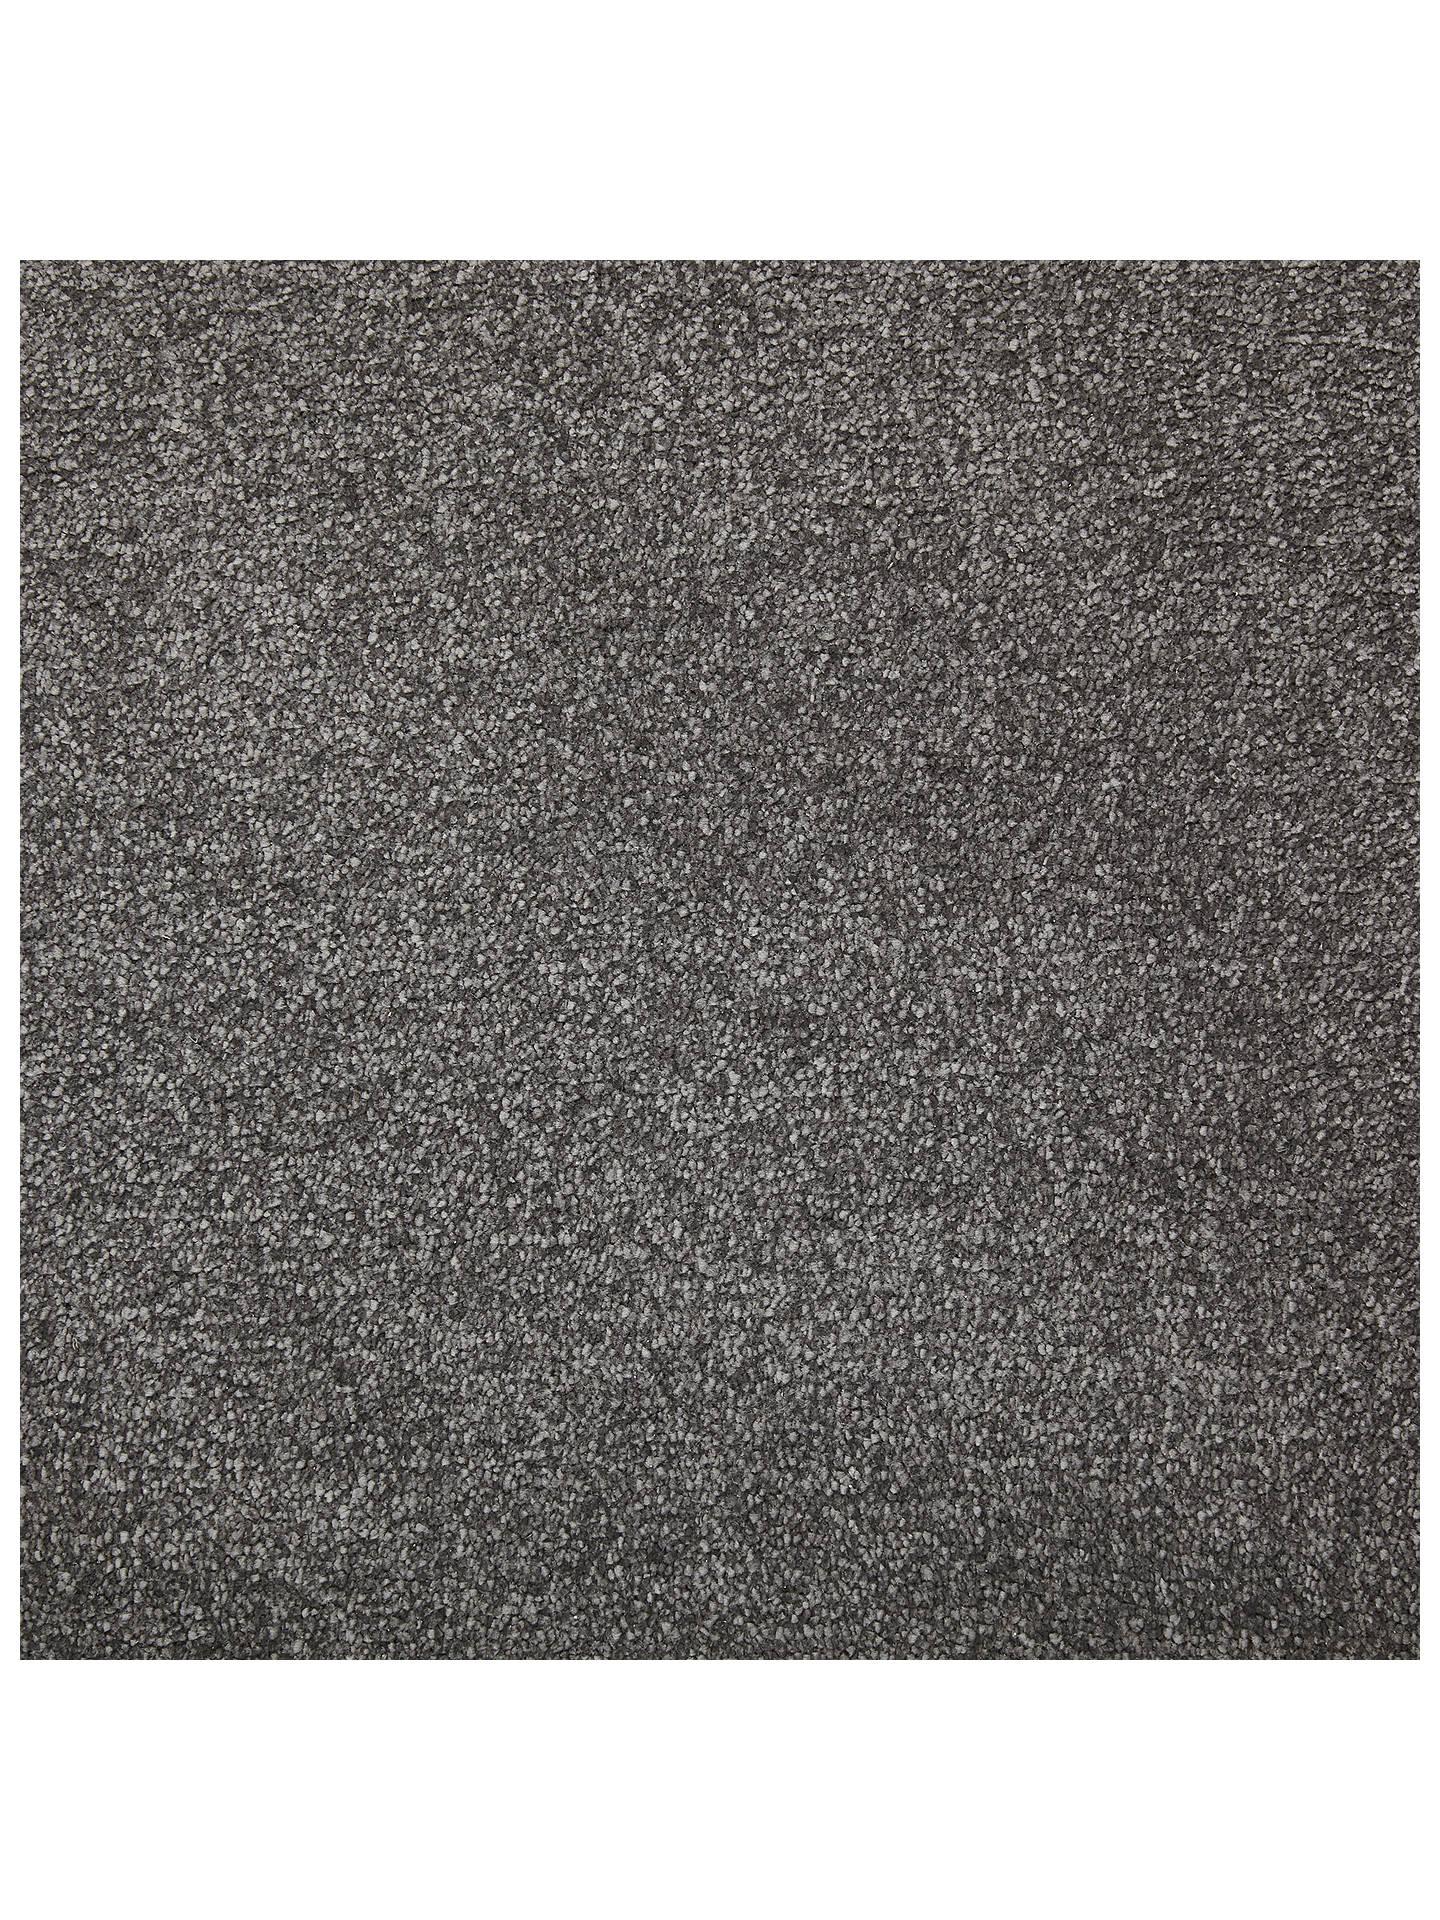 Buy John Lewis Luxury Super Soft Twist Carpet, Cavalry Grey Online at johnlewis.com